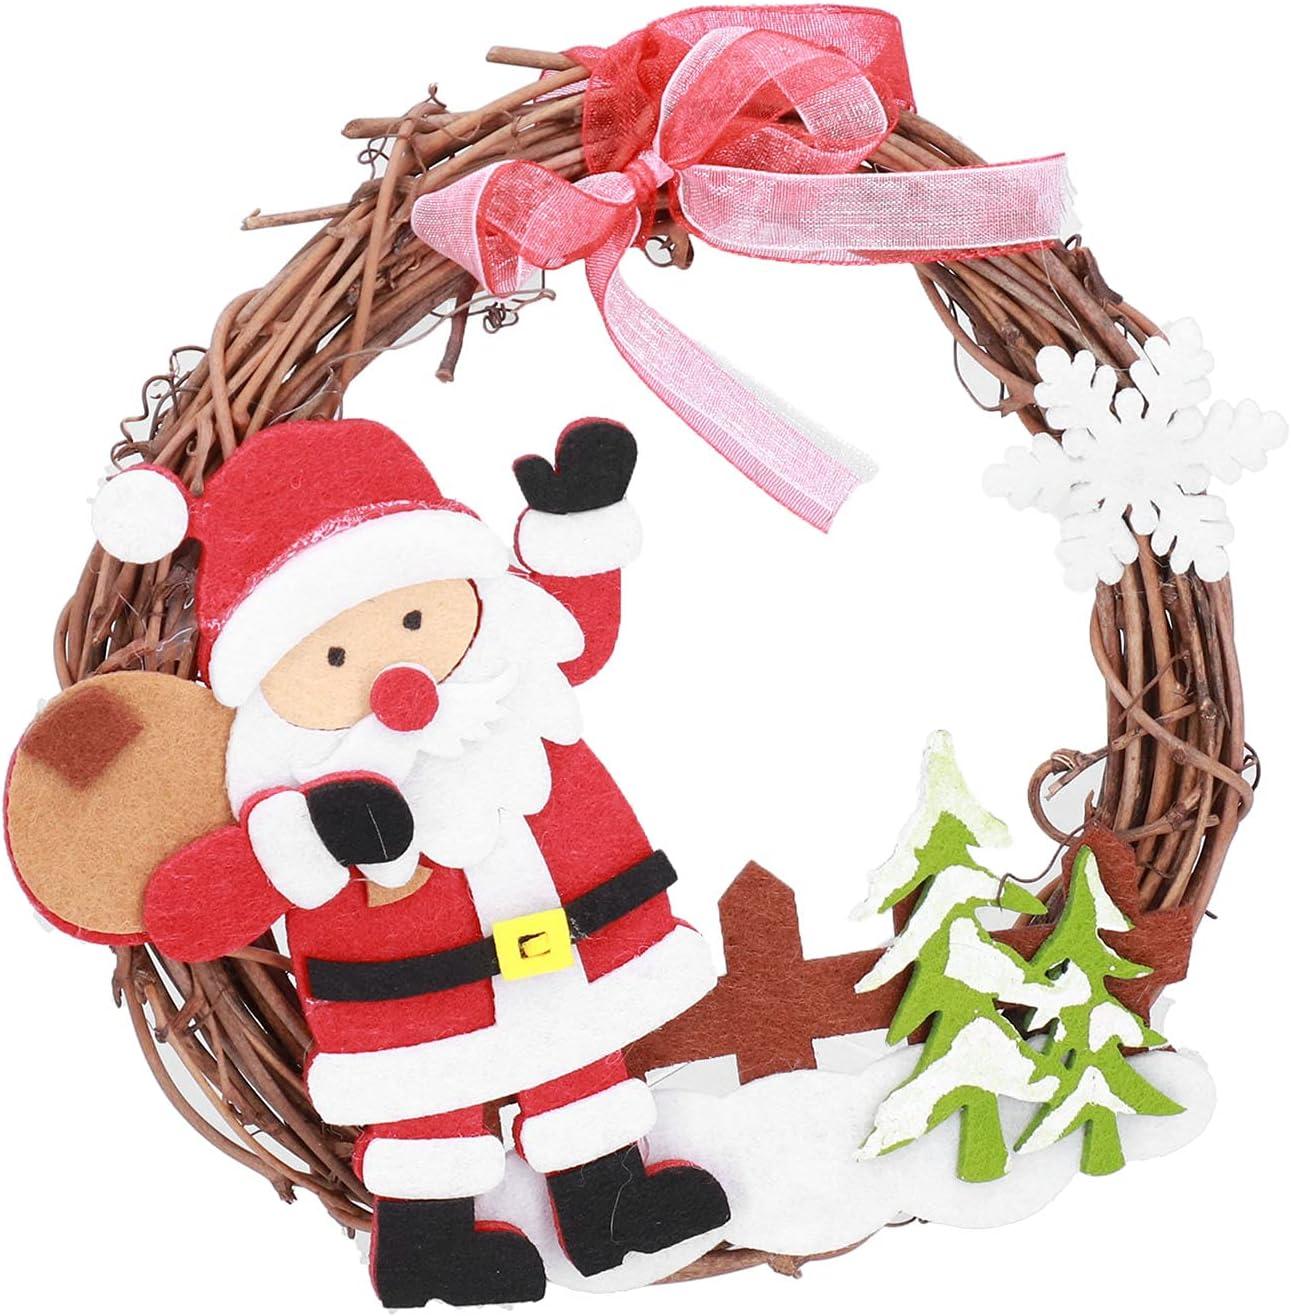 LIKJ Ranking TOP1 Christmas Ornament Beautiful Wreath Door Gir Detroit Mall for